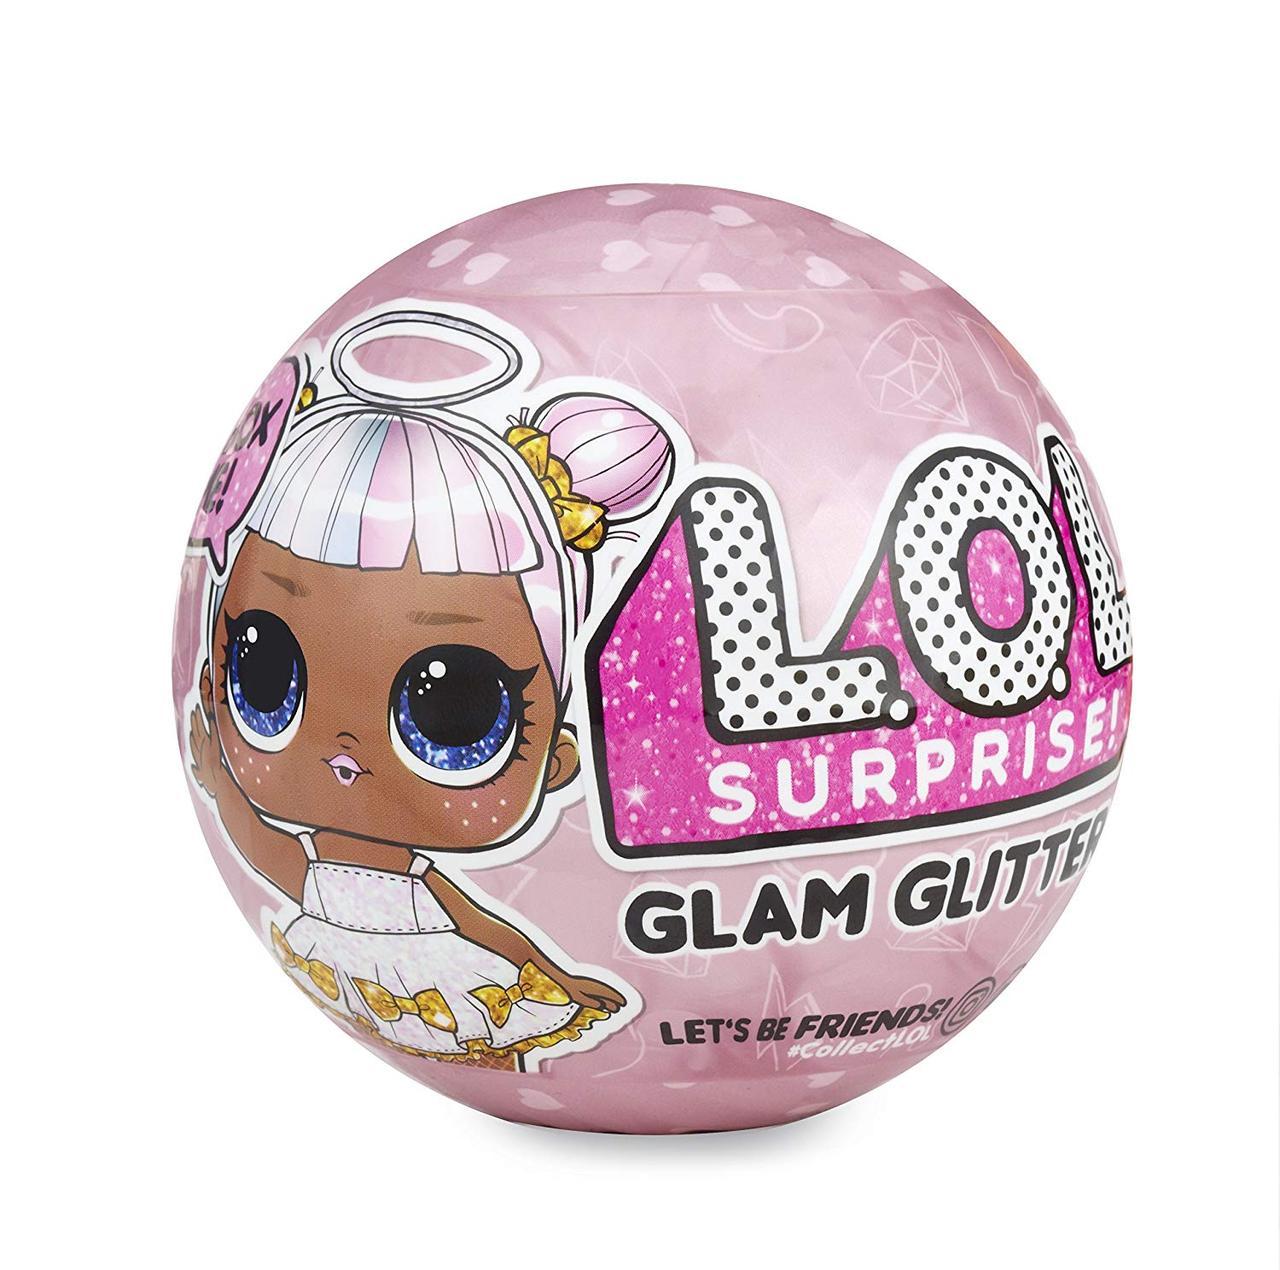 "L.O.L. Surprise Glam Glitter Series 100% Оригинал Кукла Лол Глем "" Гламур Блестящий "" MGA"